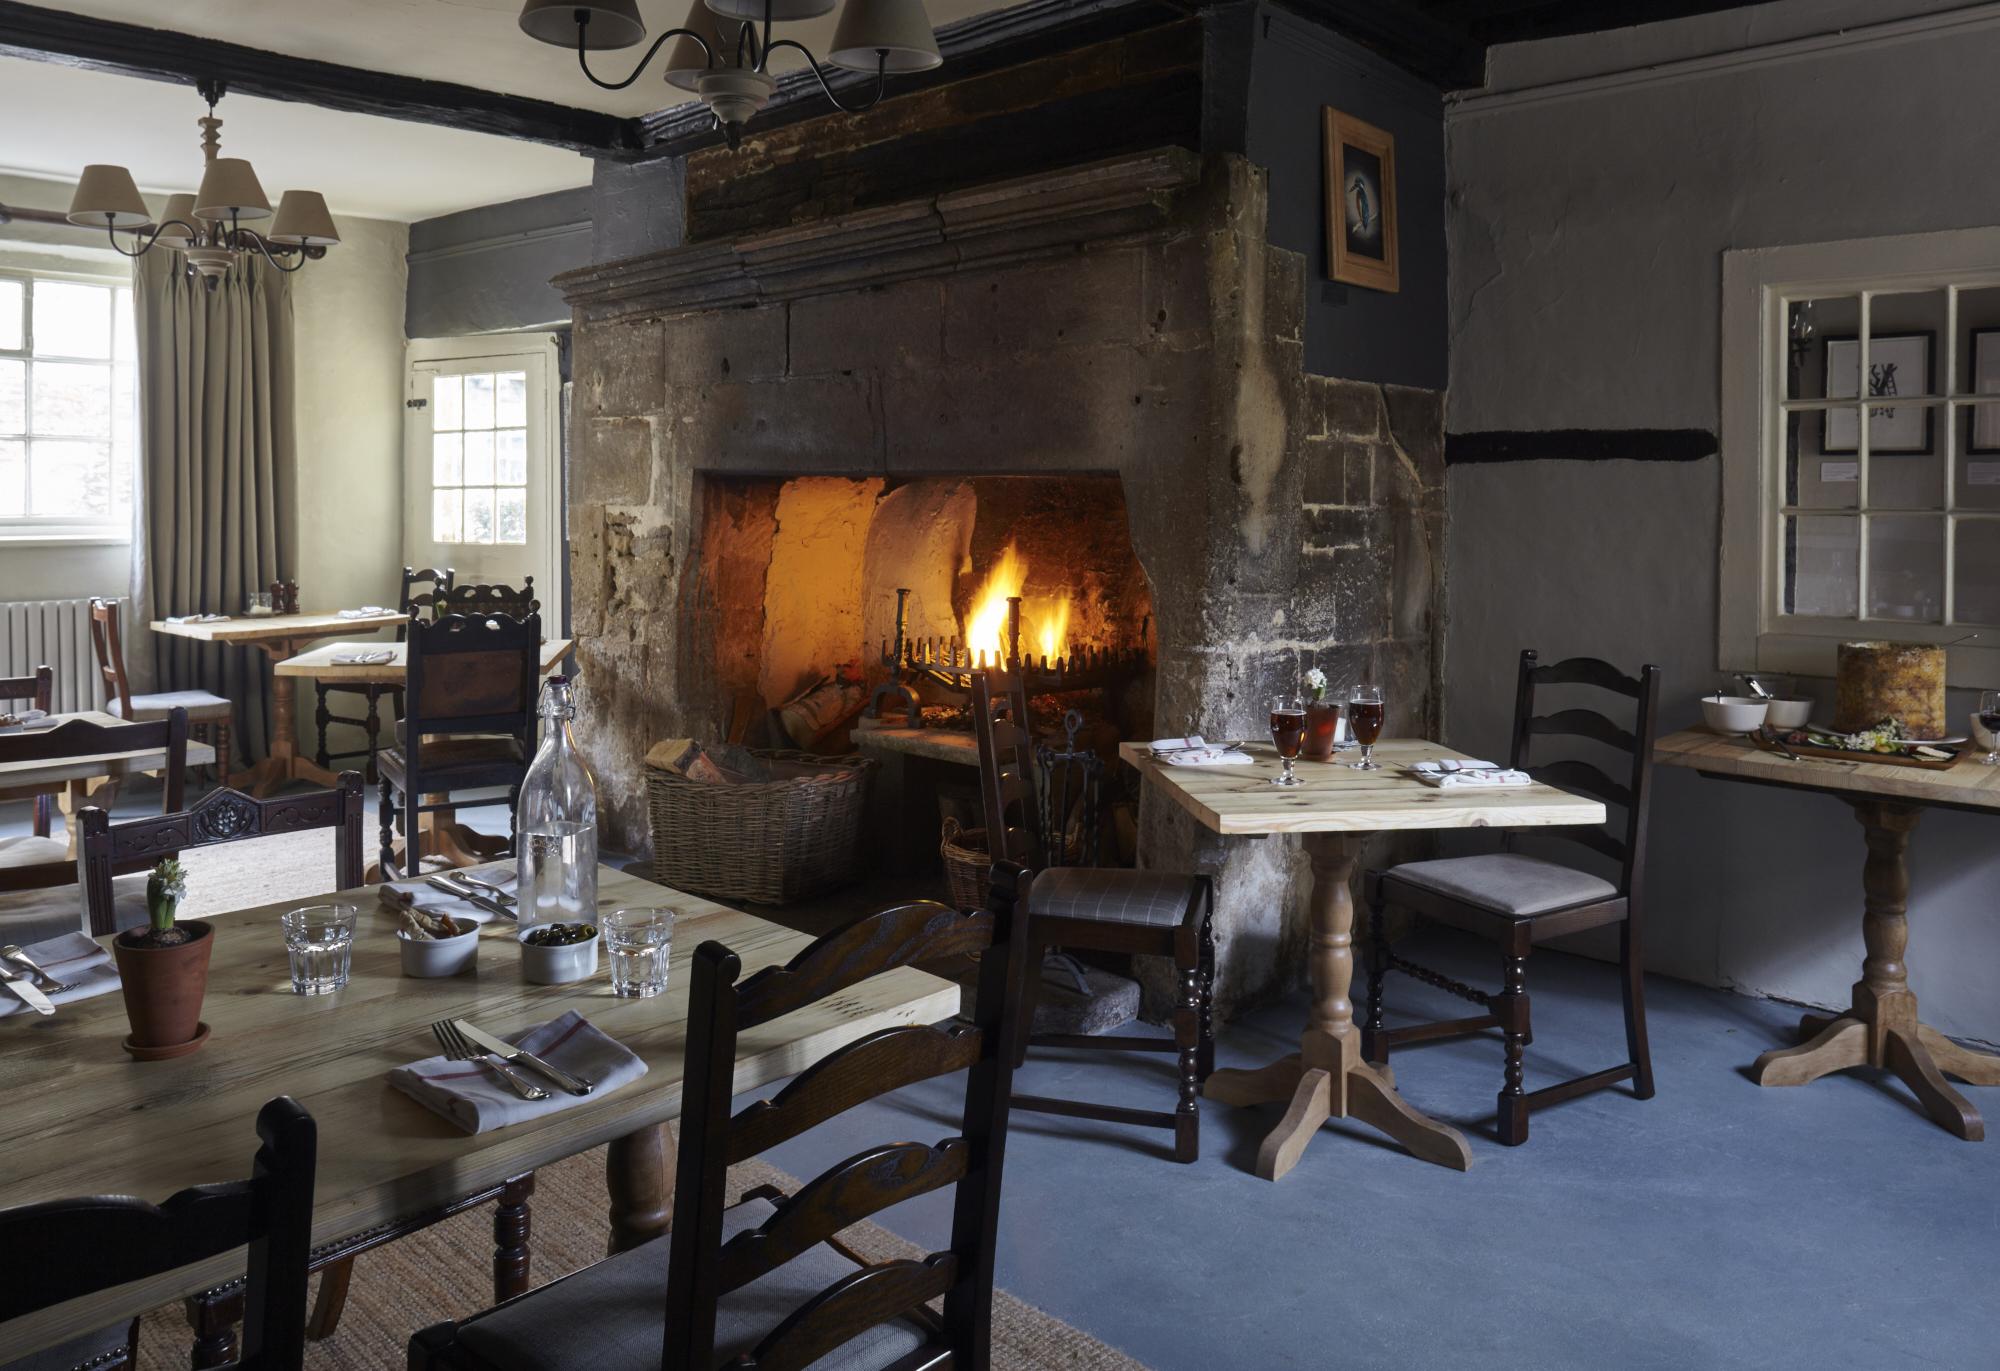 Sign of the Angel Inn, Lacock,